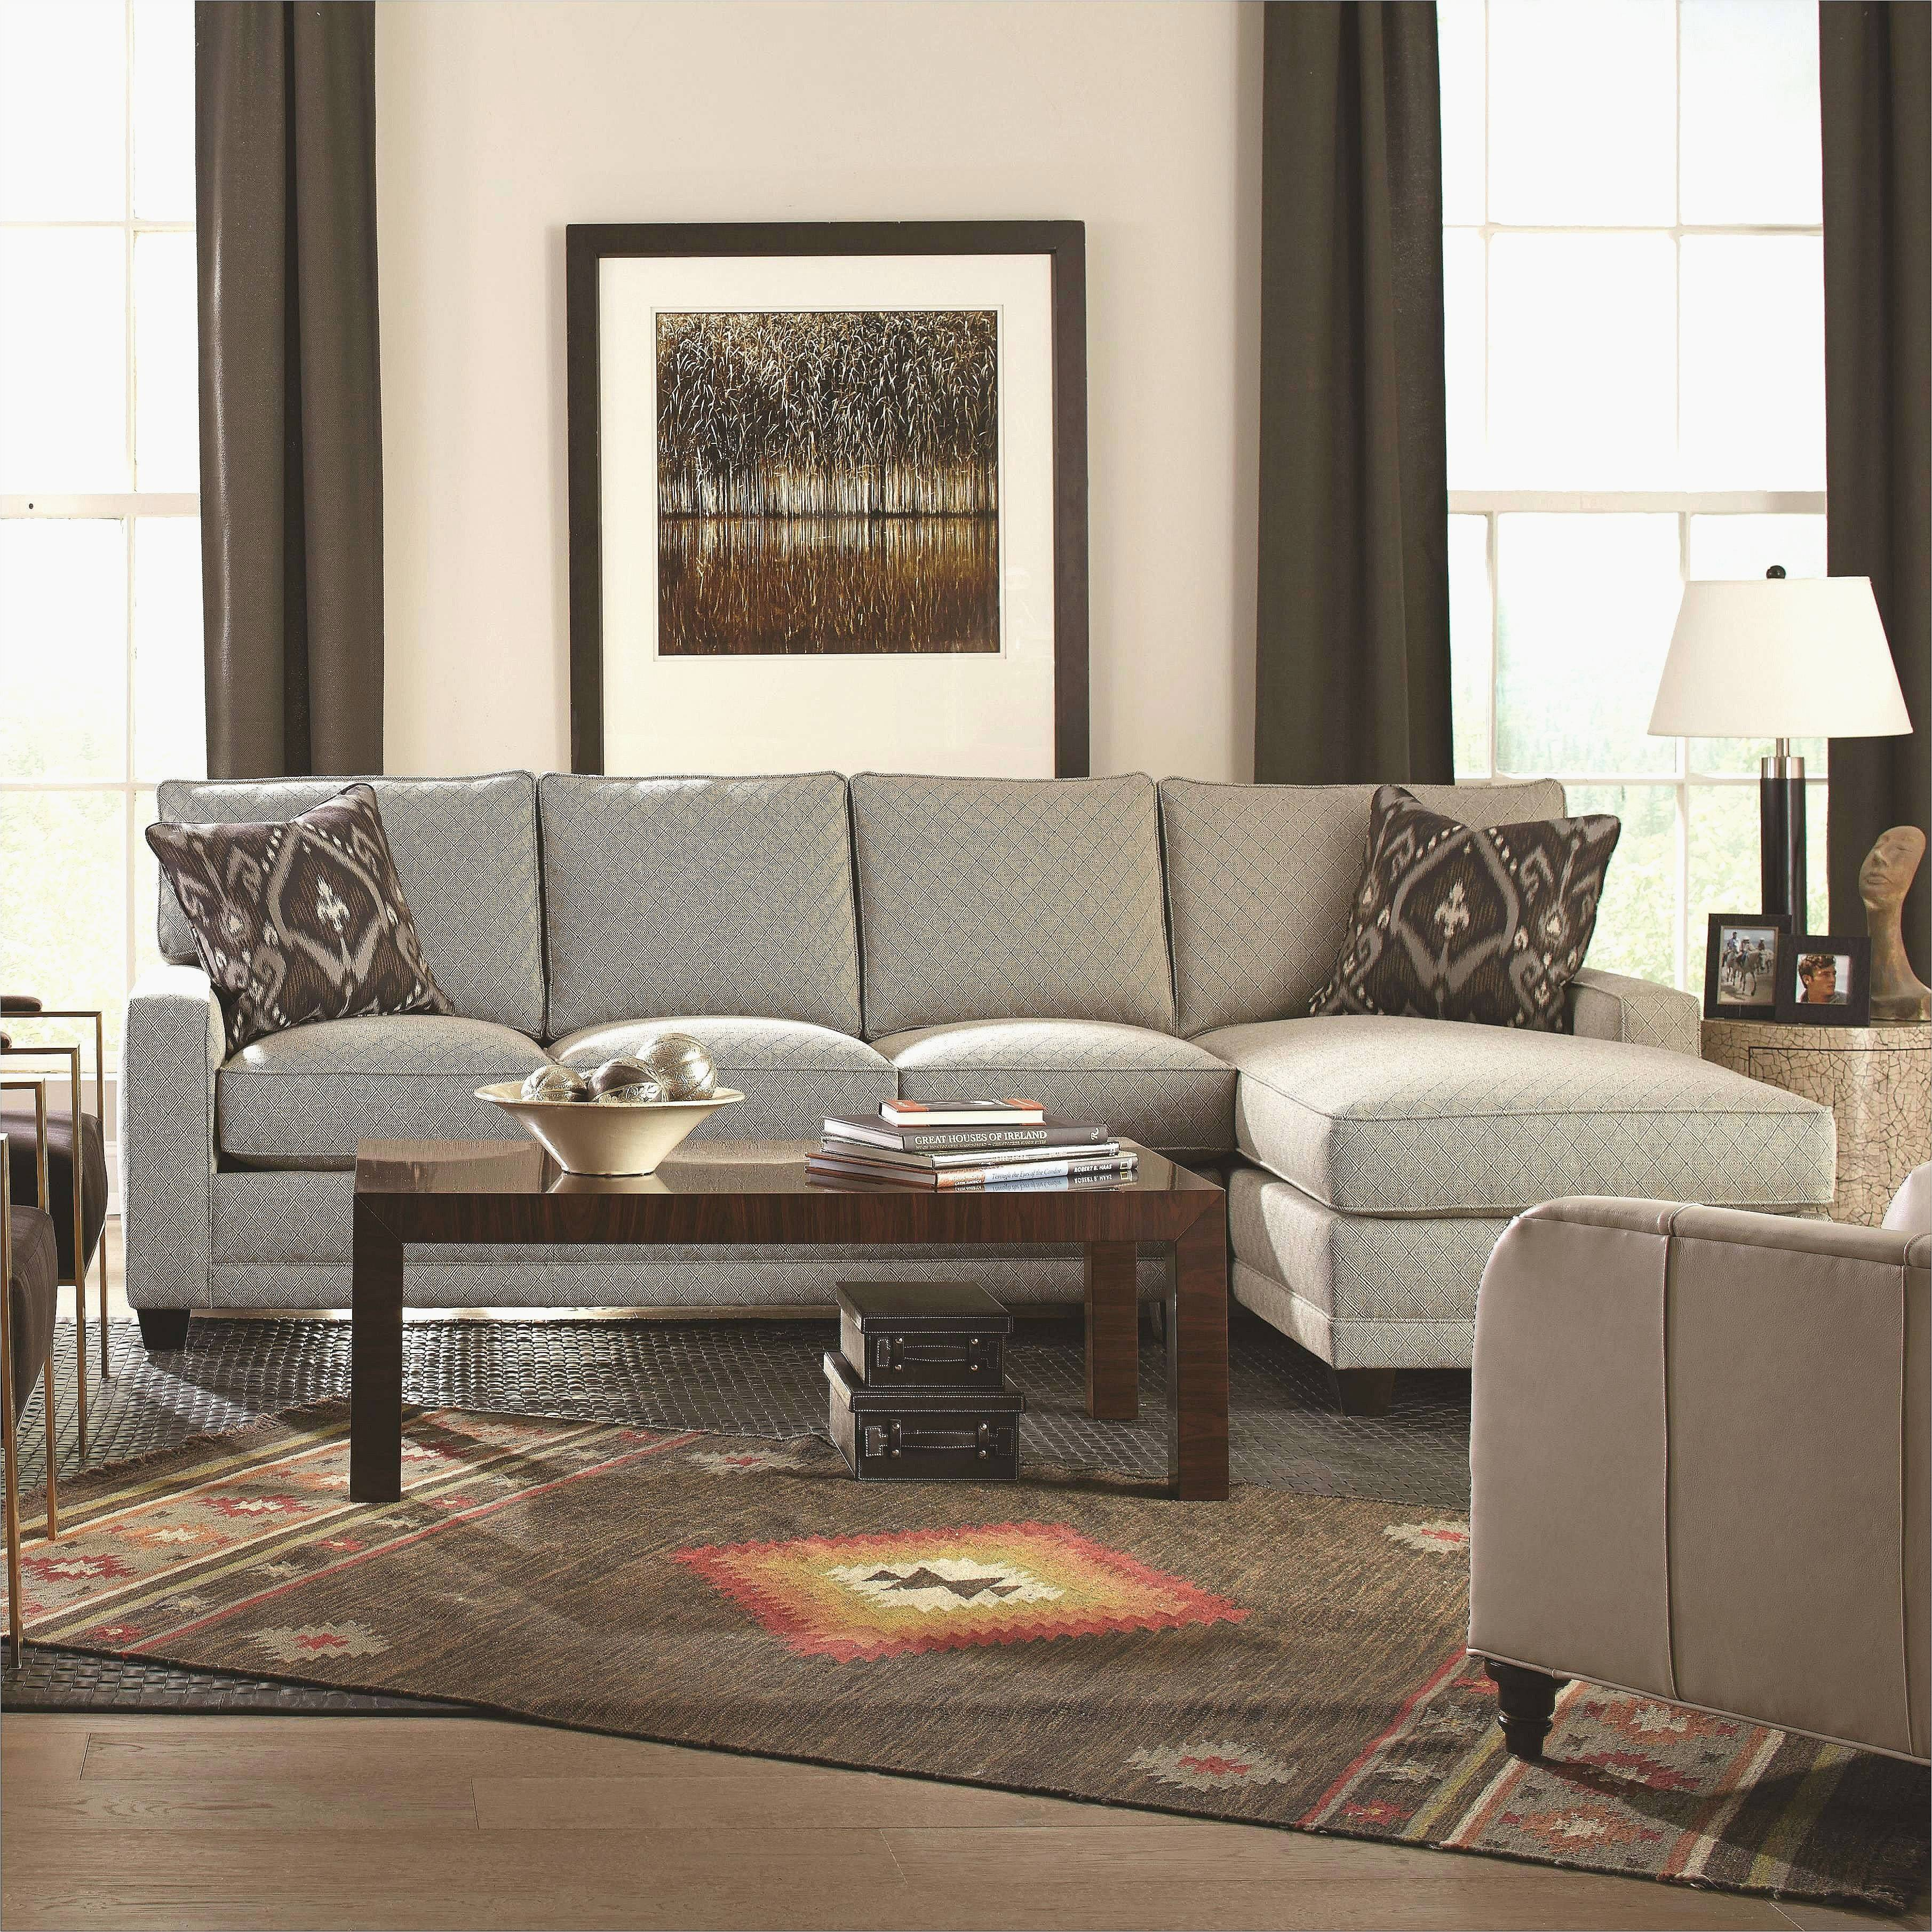 modern design for living room best of home decor living room lovely modern living room furniture new of modern design for living room